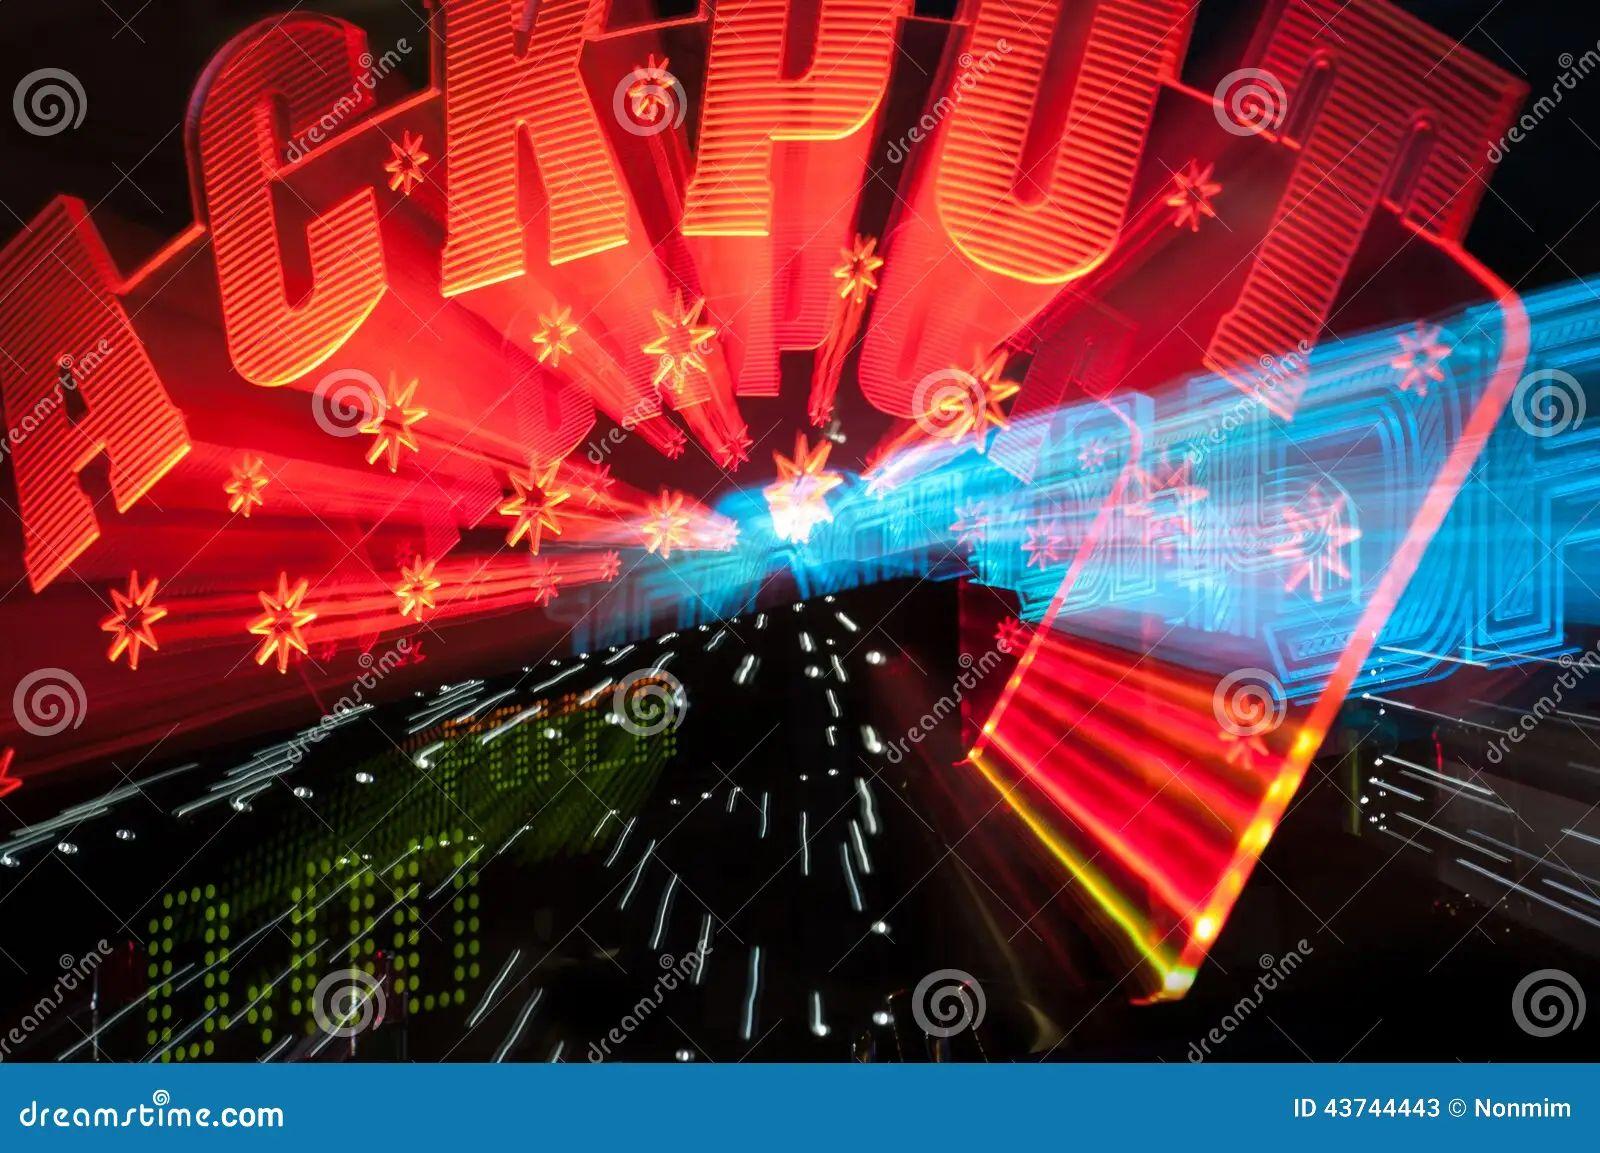 Jackpot Winner Sign From Casino Gambling And Amusement Auto Wiring Diagram